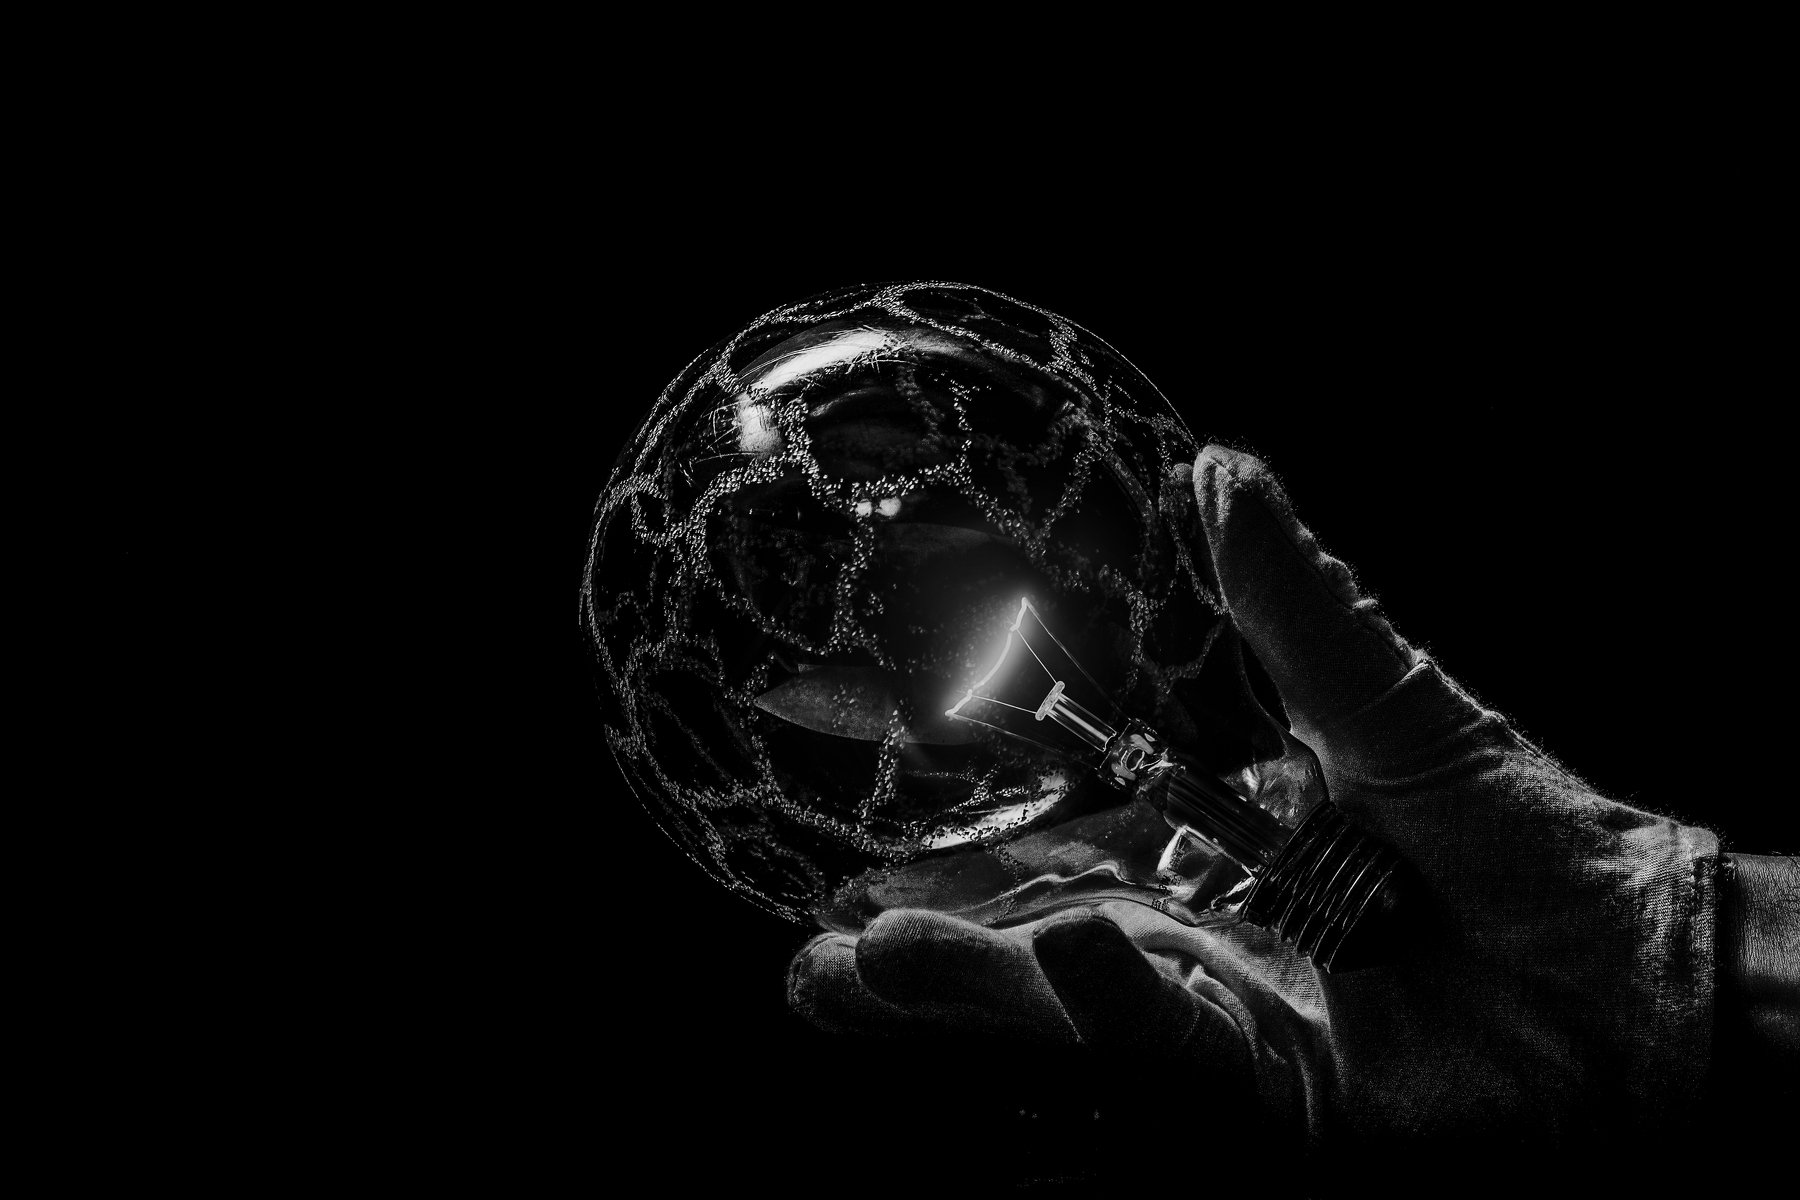 bnw, lamp, light, energy, filament, hot, electricity, Antonio Bernardino